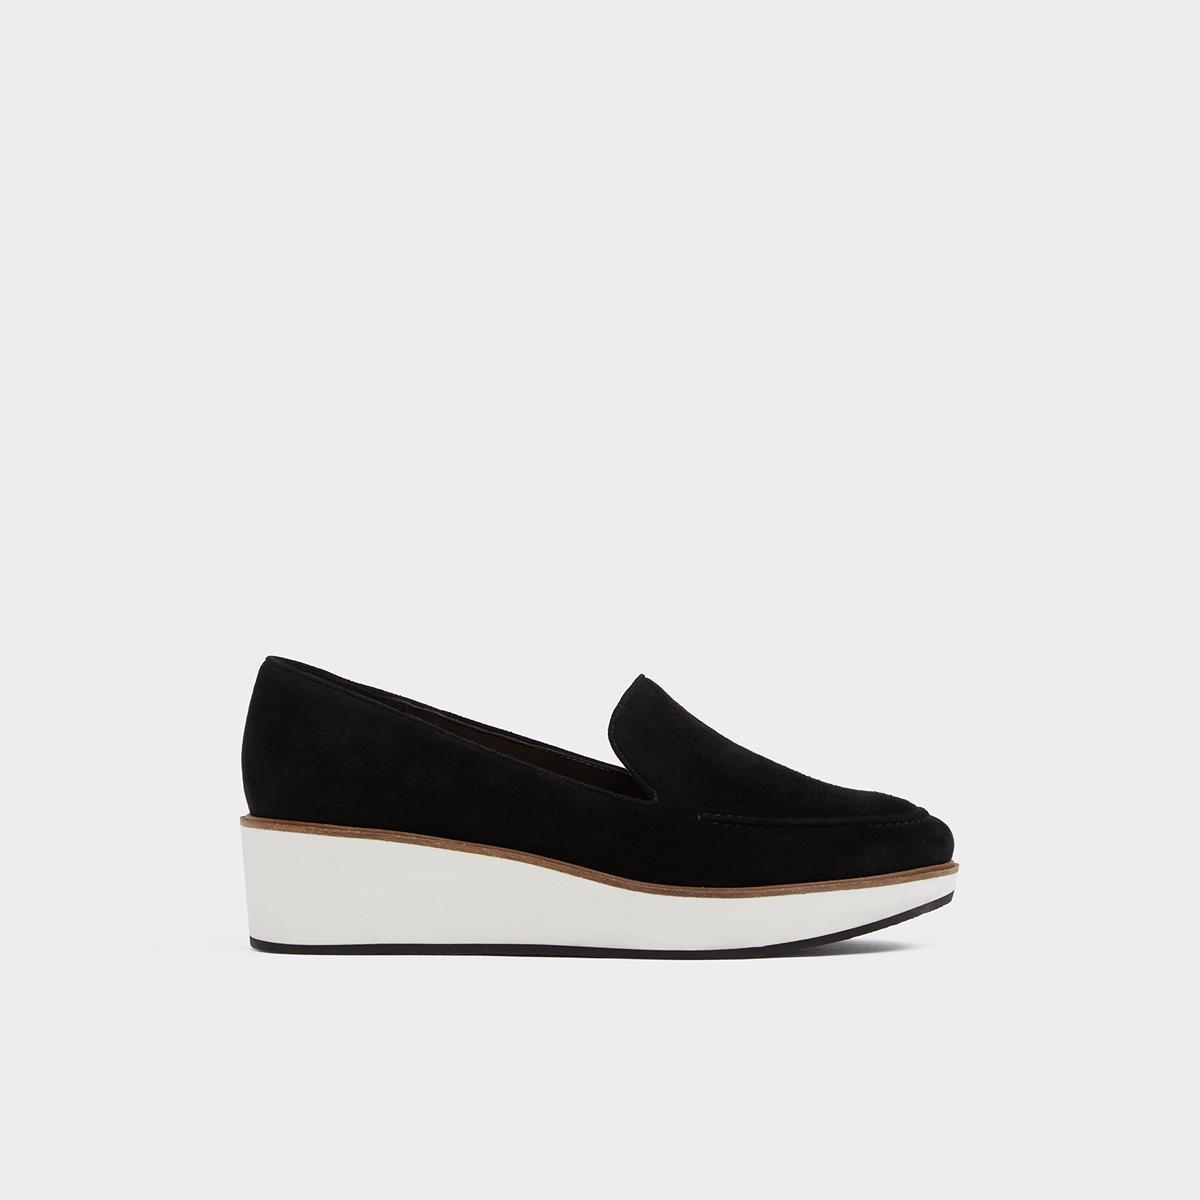 e4fa32789f3 Nydaedda Black Other Women s Heels